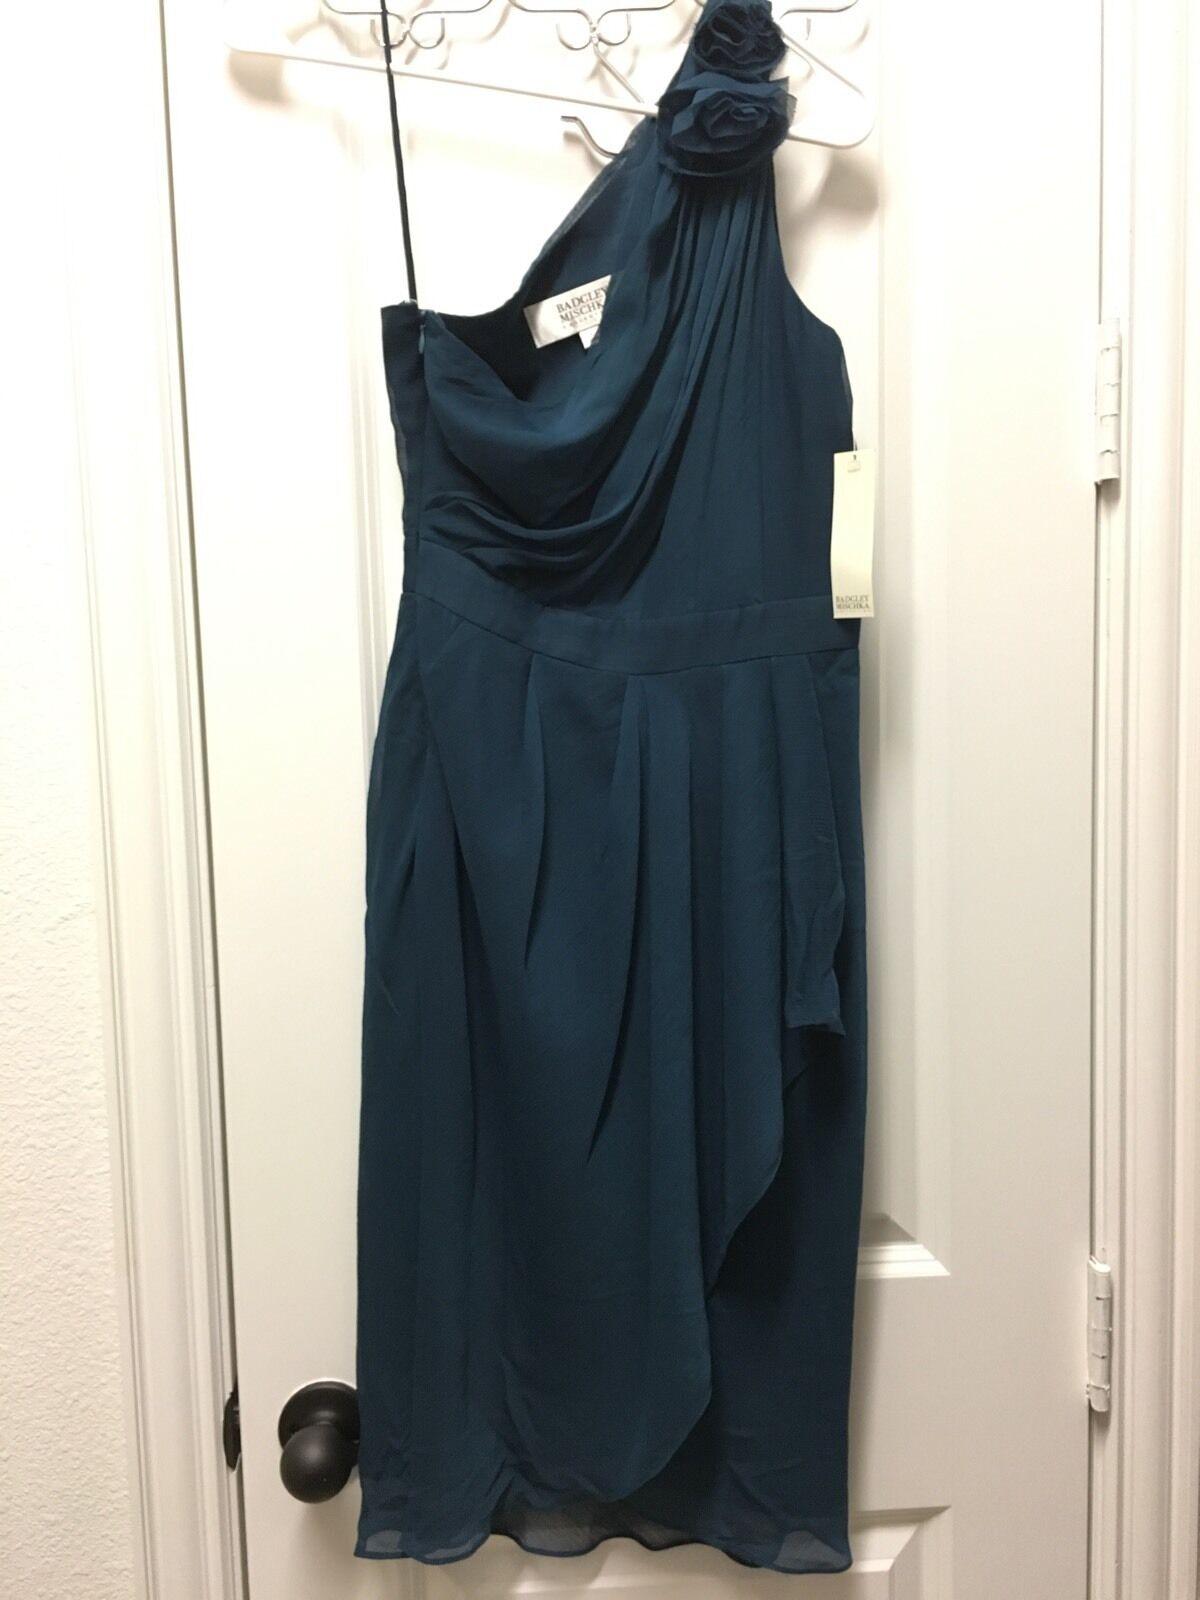 Badgley Mischka One Shoulder Dress in Teal - Size 0